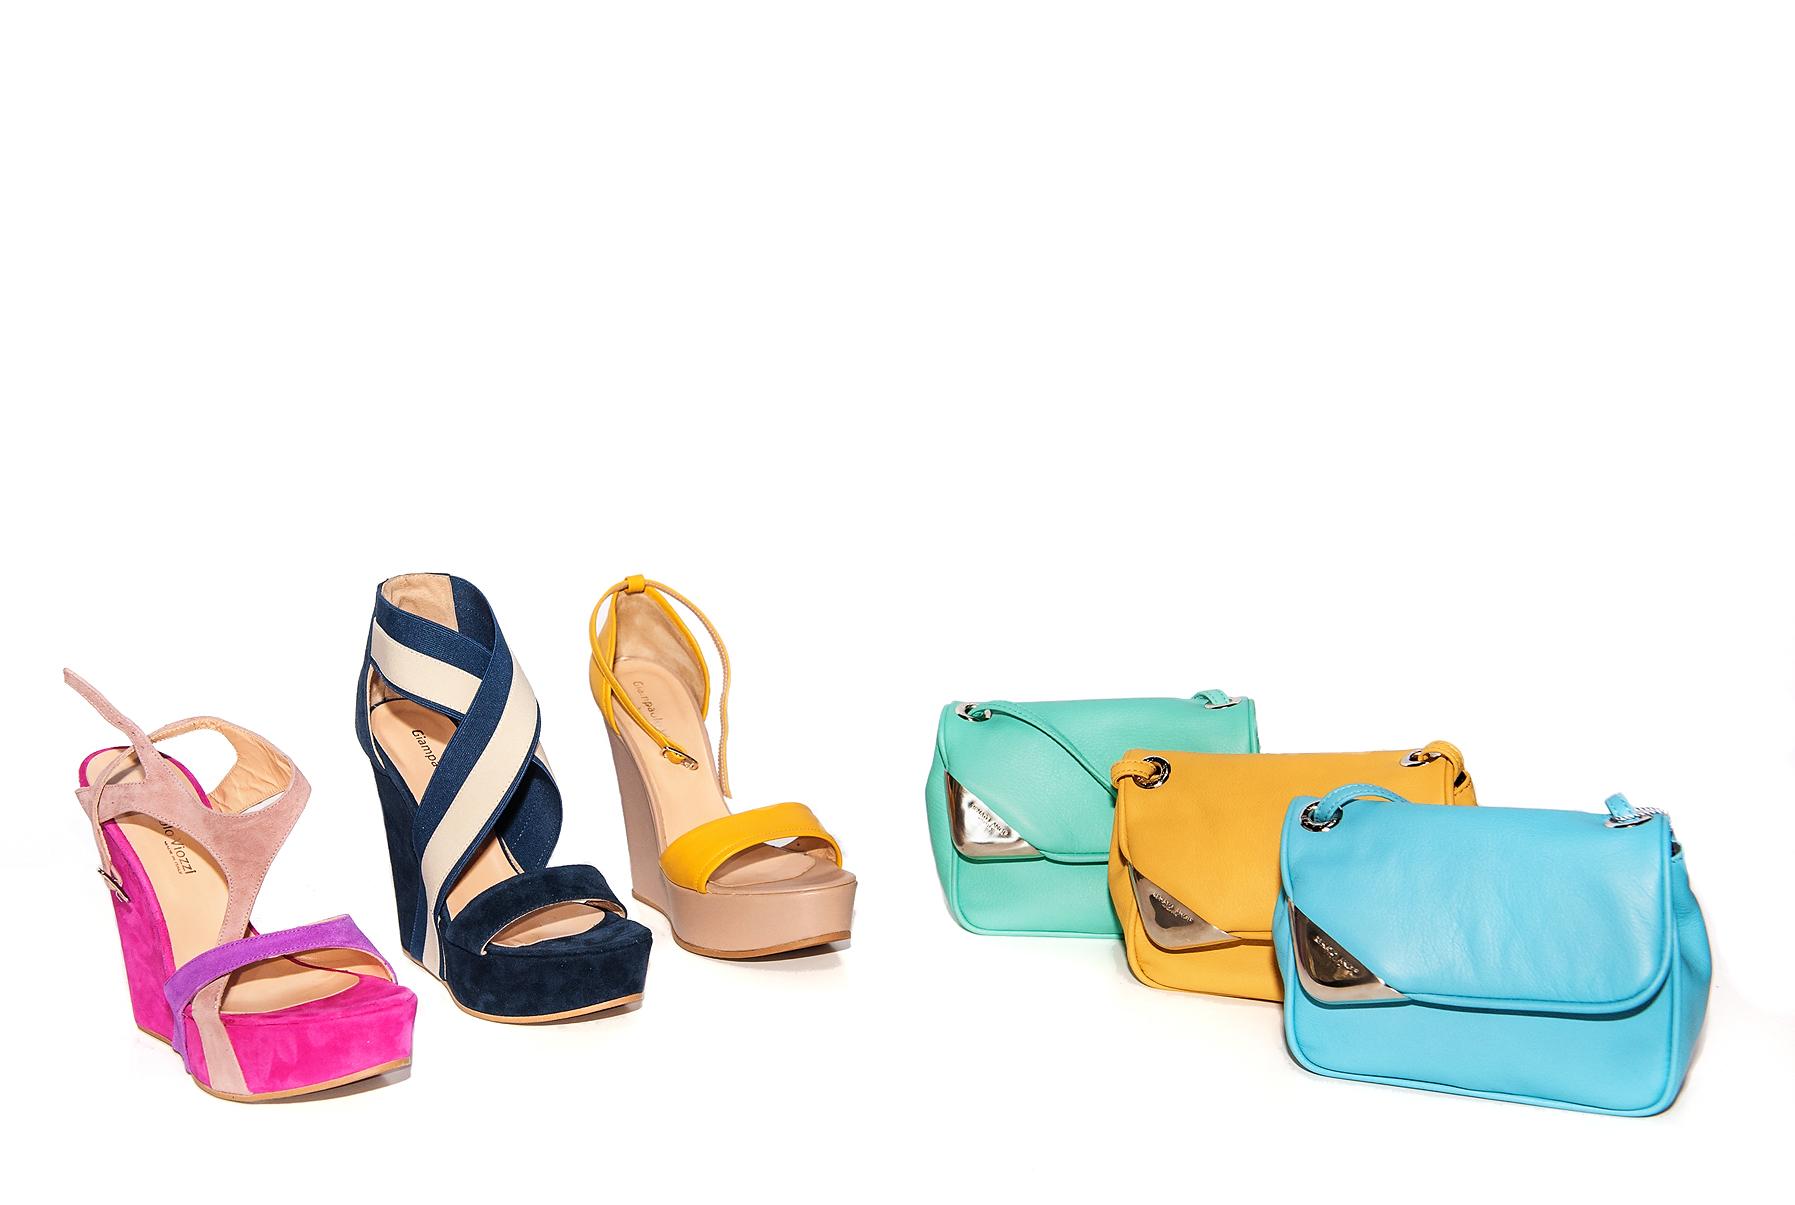 Скидки на обувь в Чебоксарах Бон Марше